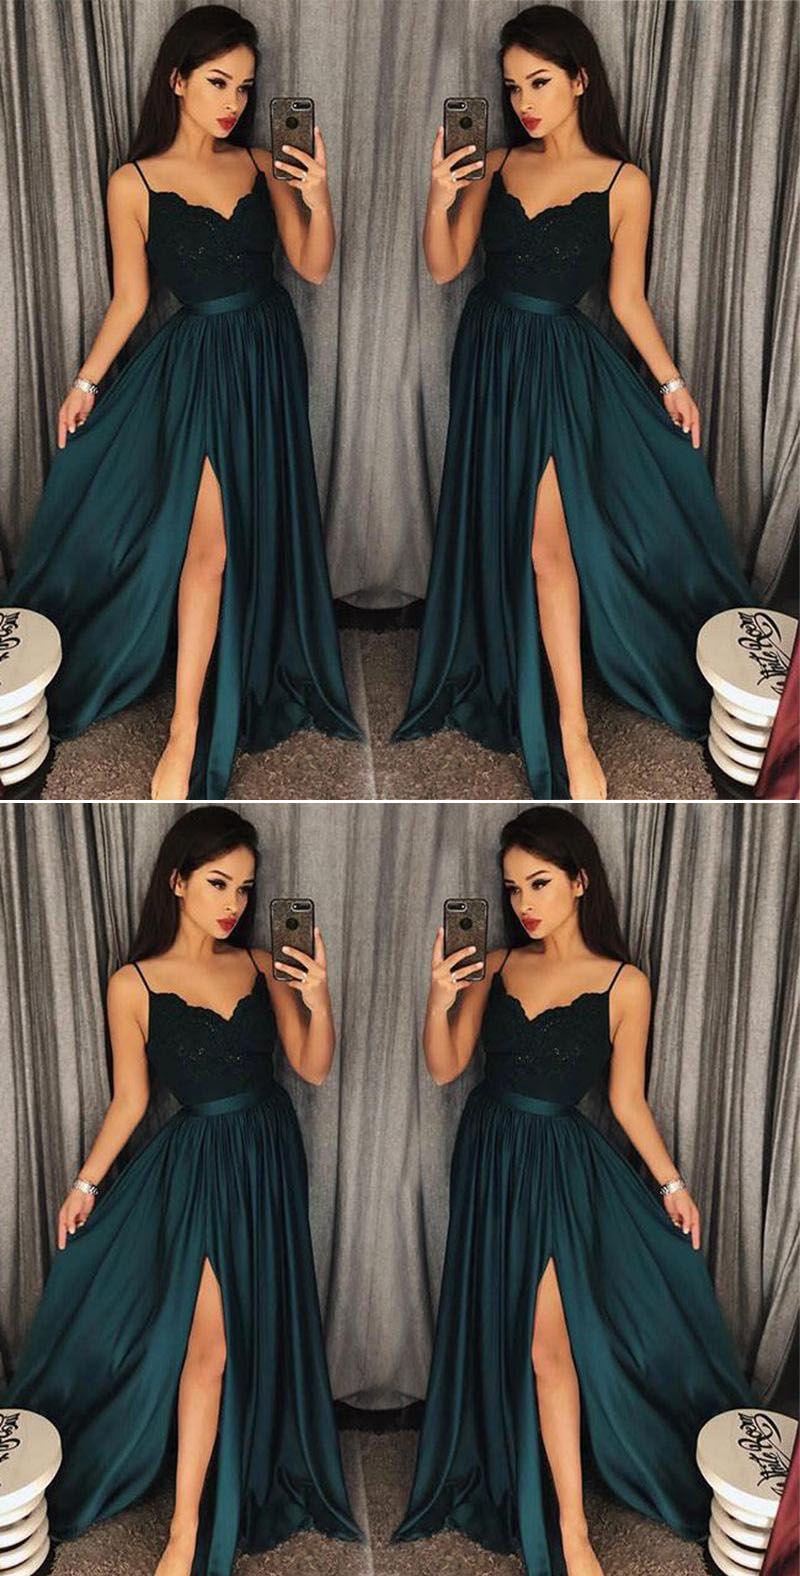 Teal Sexy Slit Prom Dresses 2020 Spaghetti Straps Girls Long Party Gown vestidos de graduacion LP7704